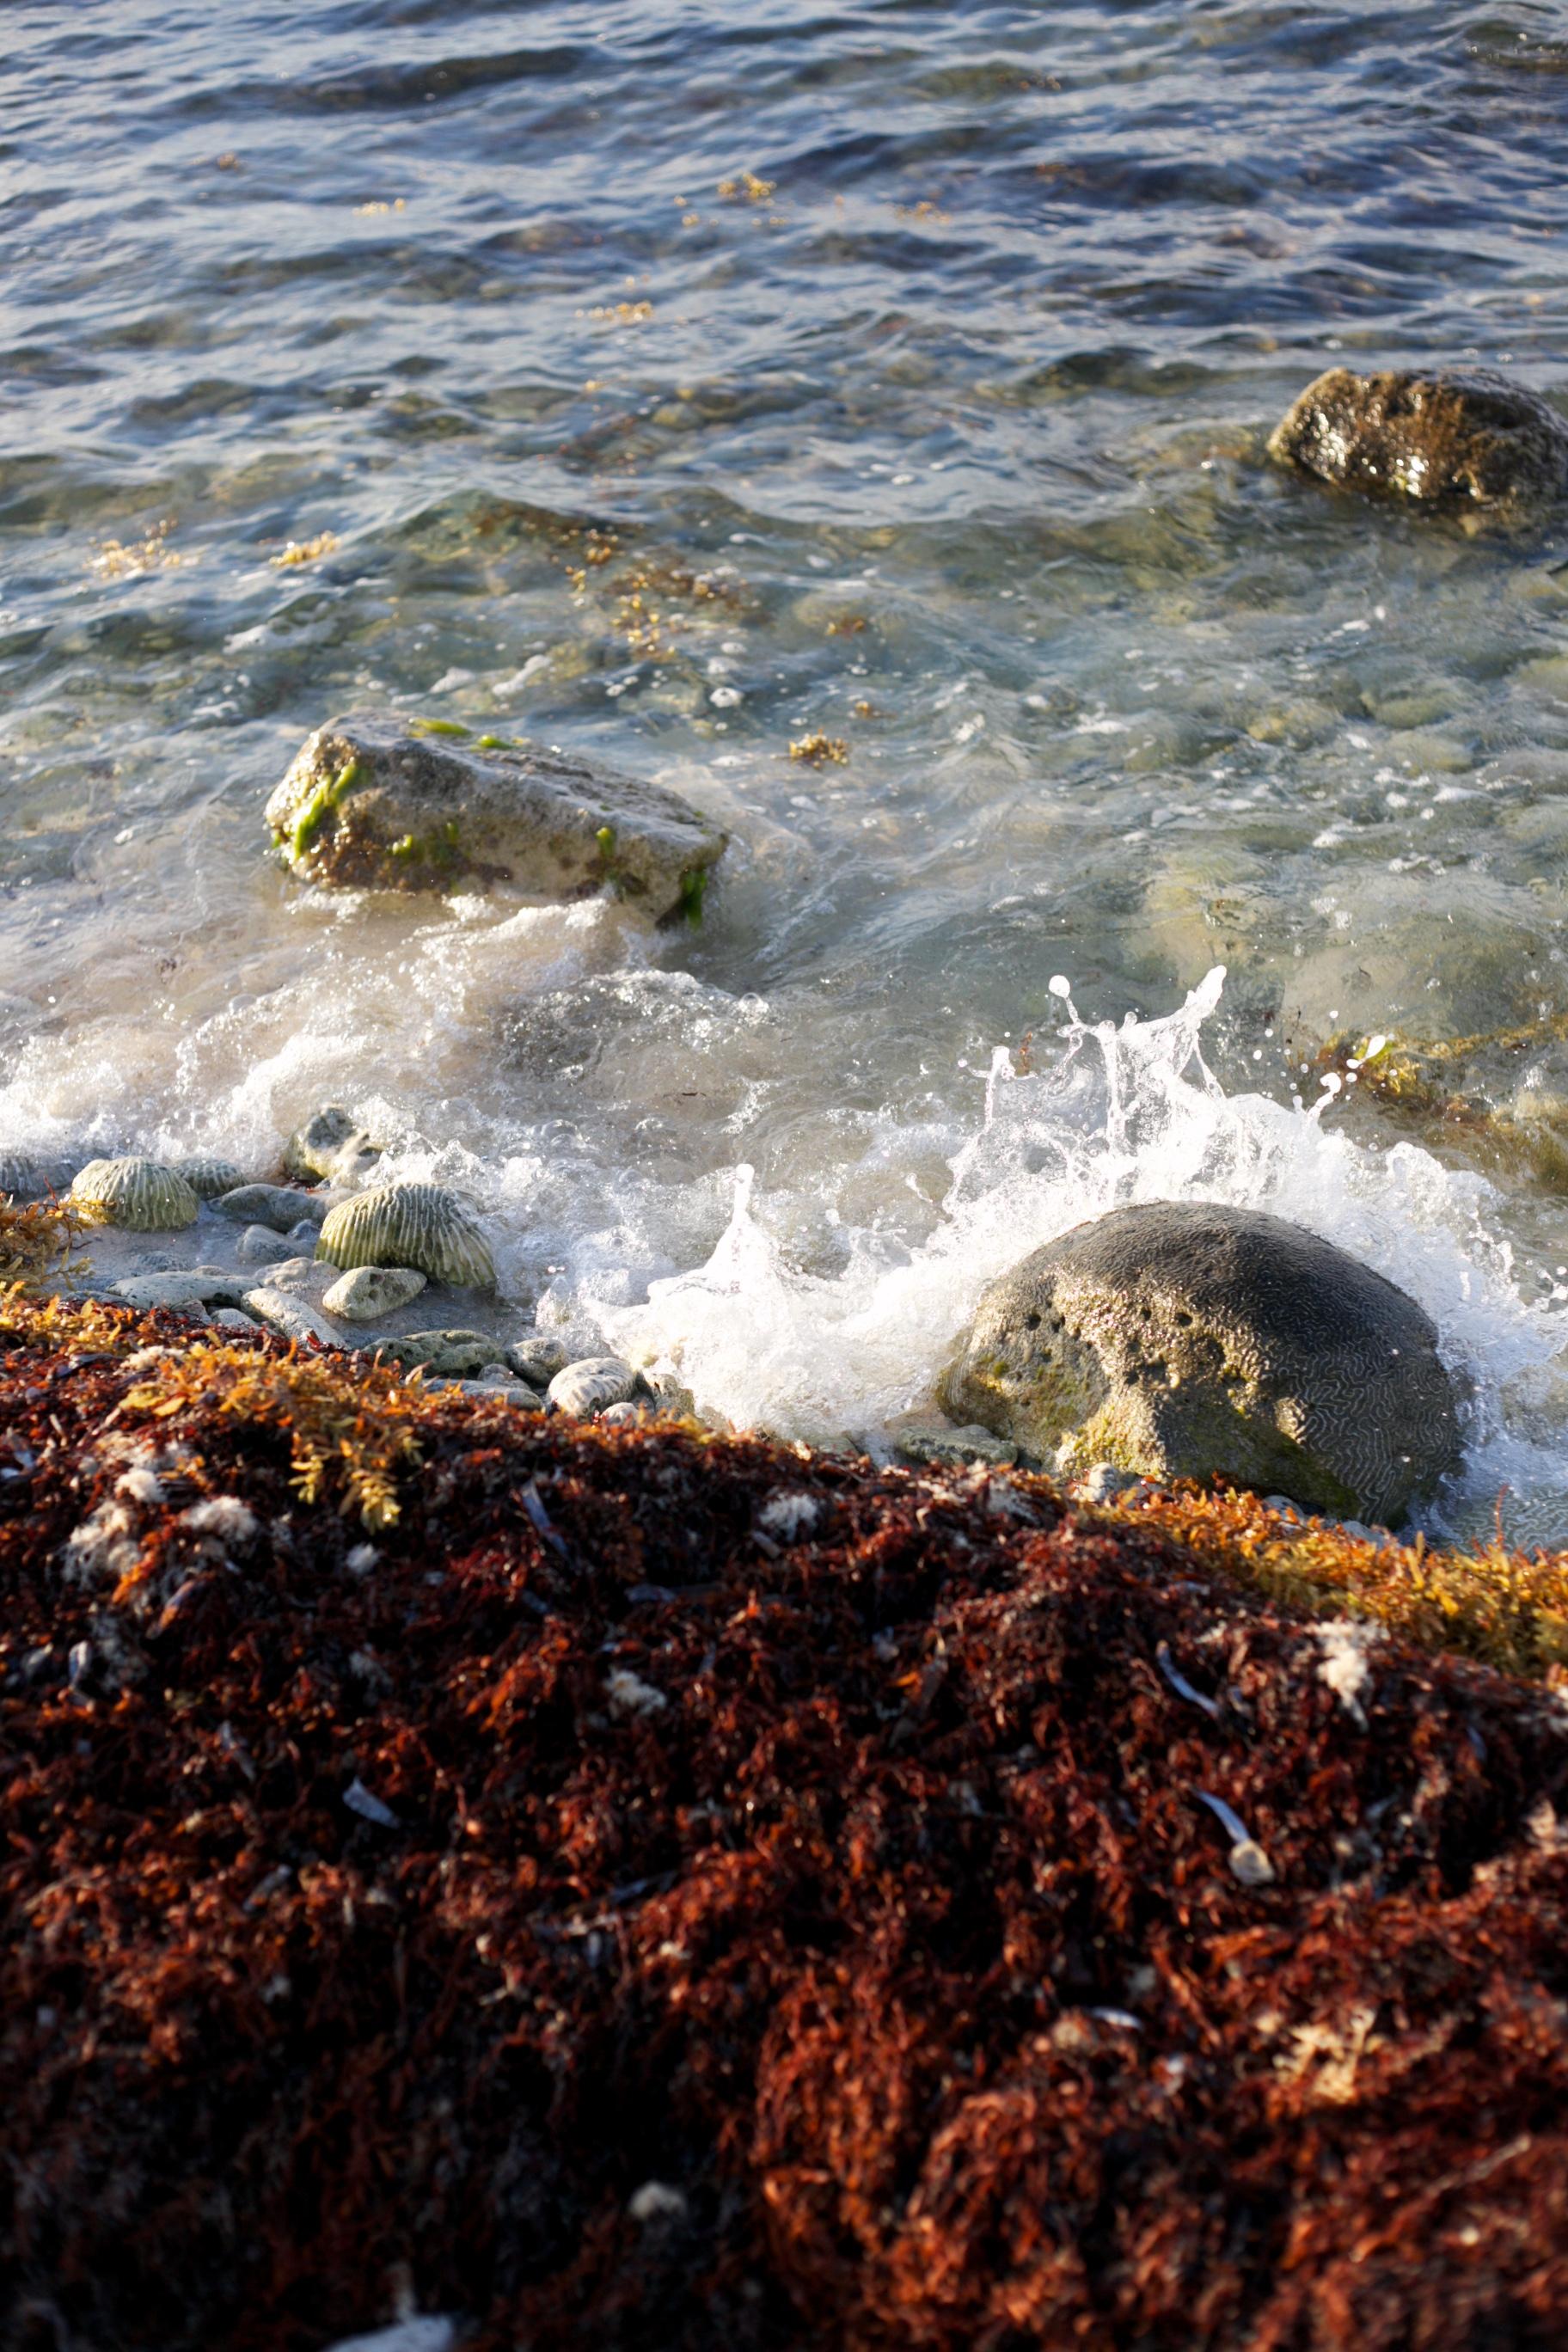 Sea water and seaweed splashing on the rocks.